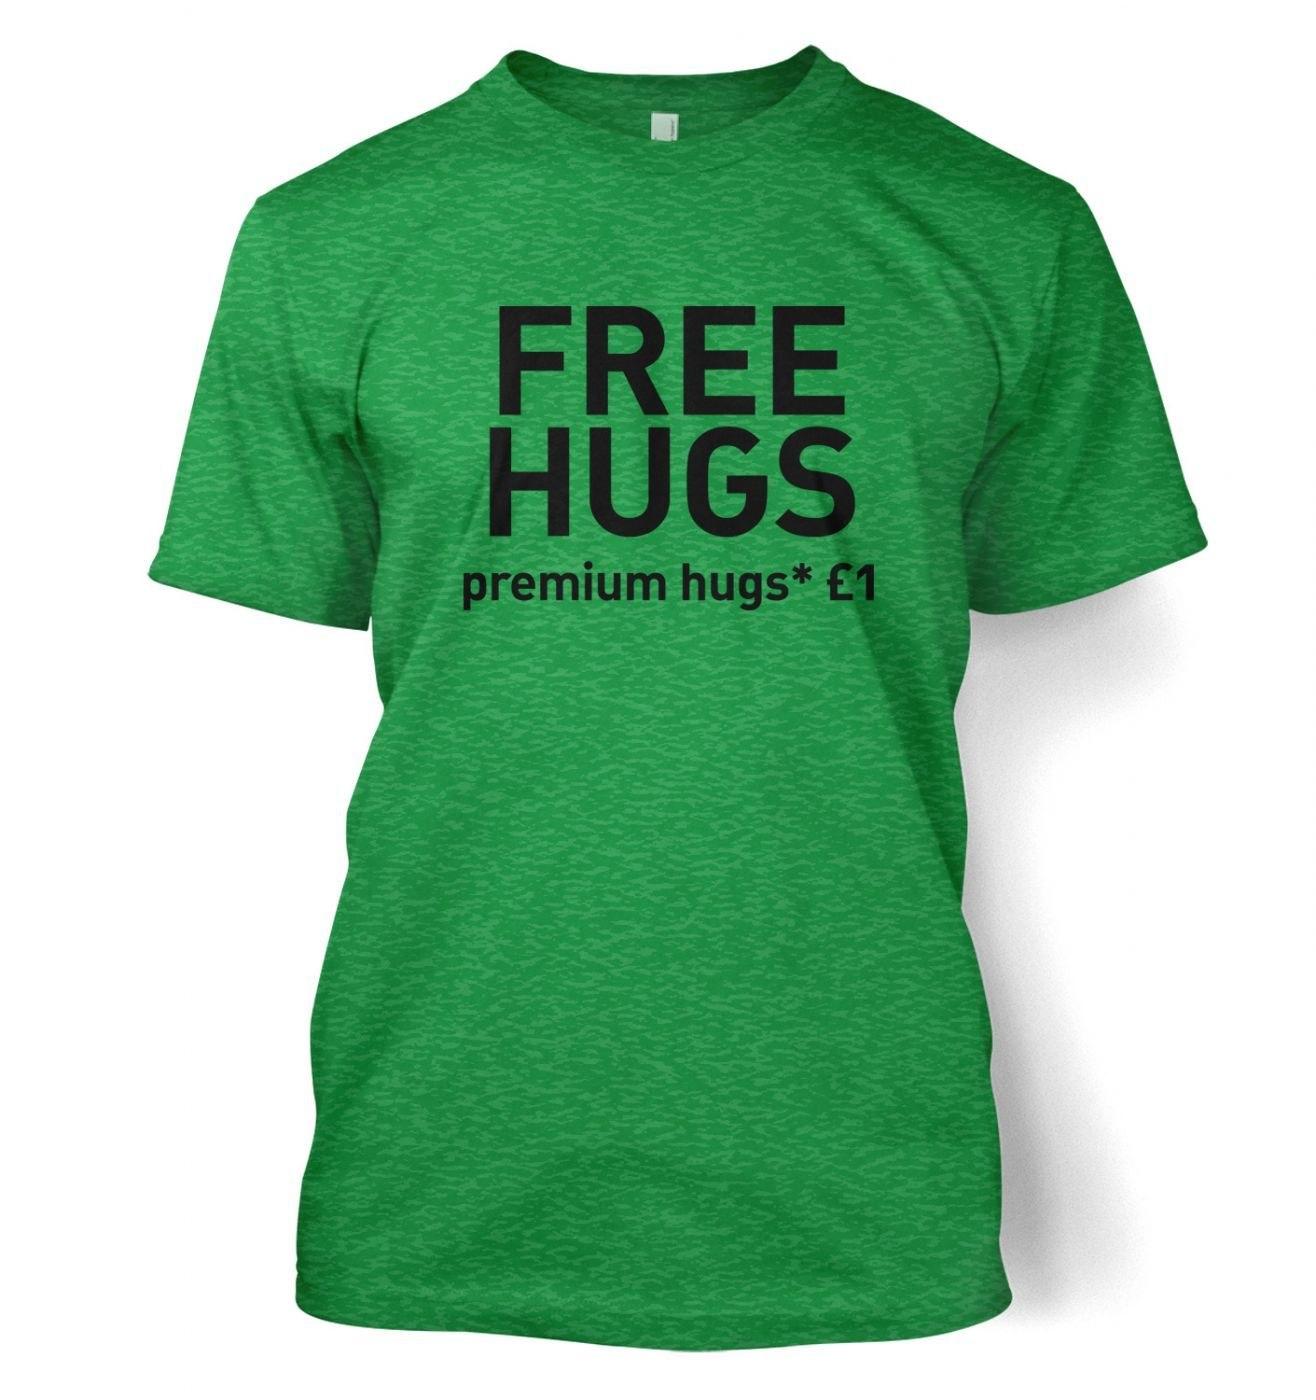 Long Torso Shirts For Men